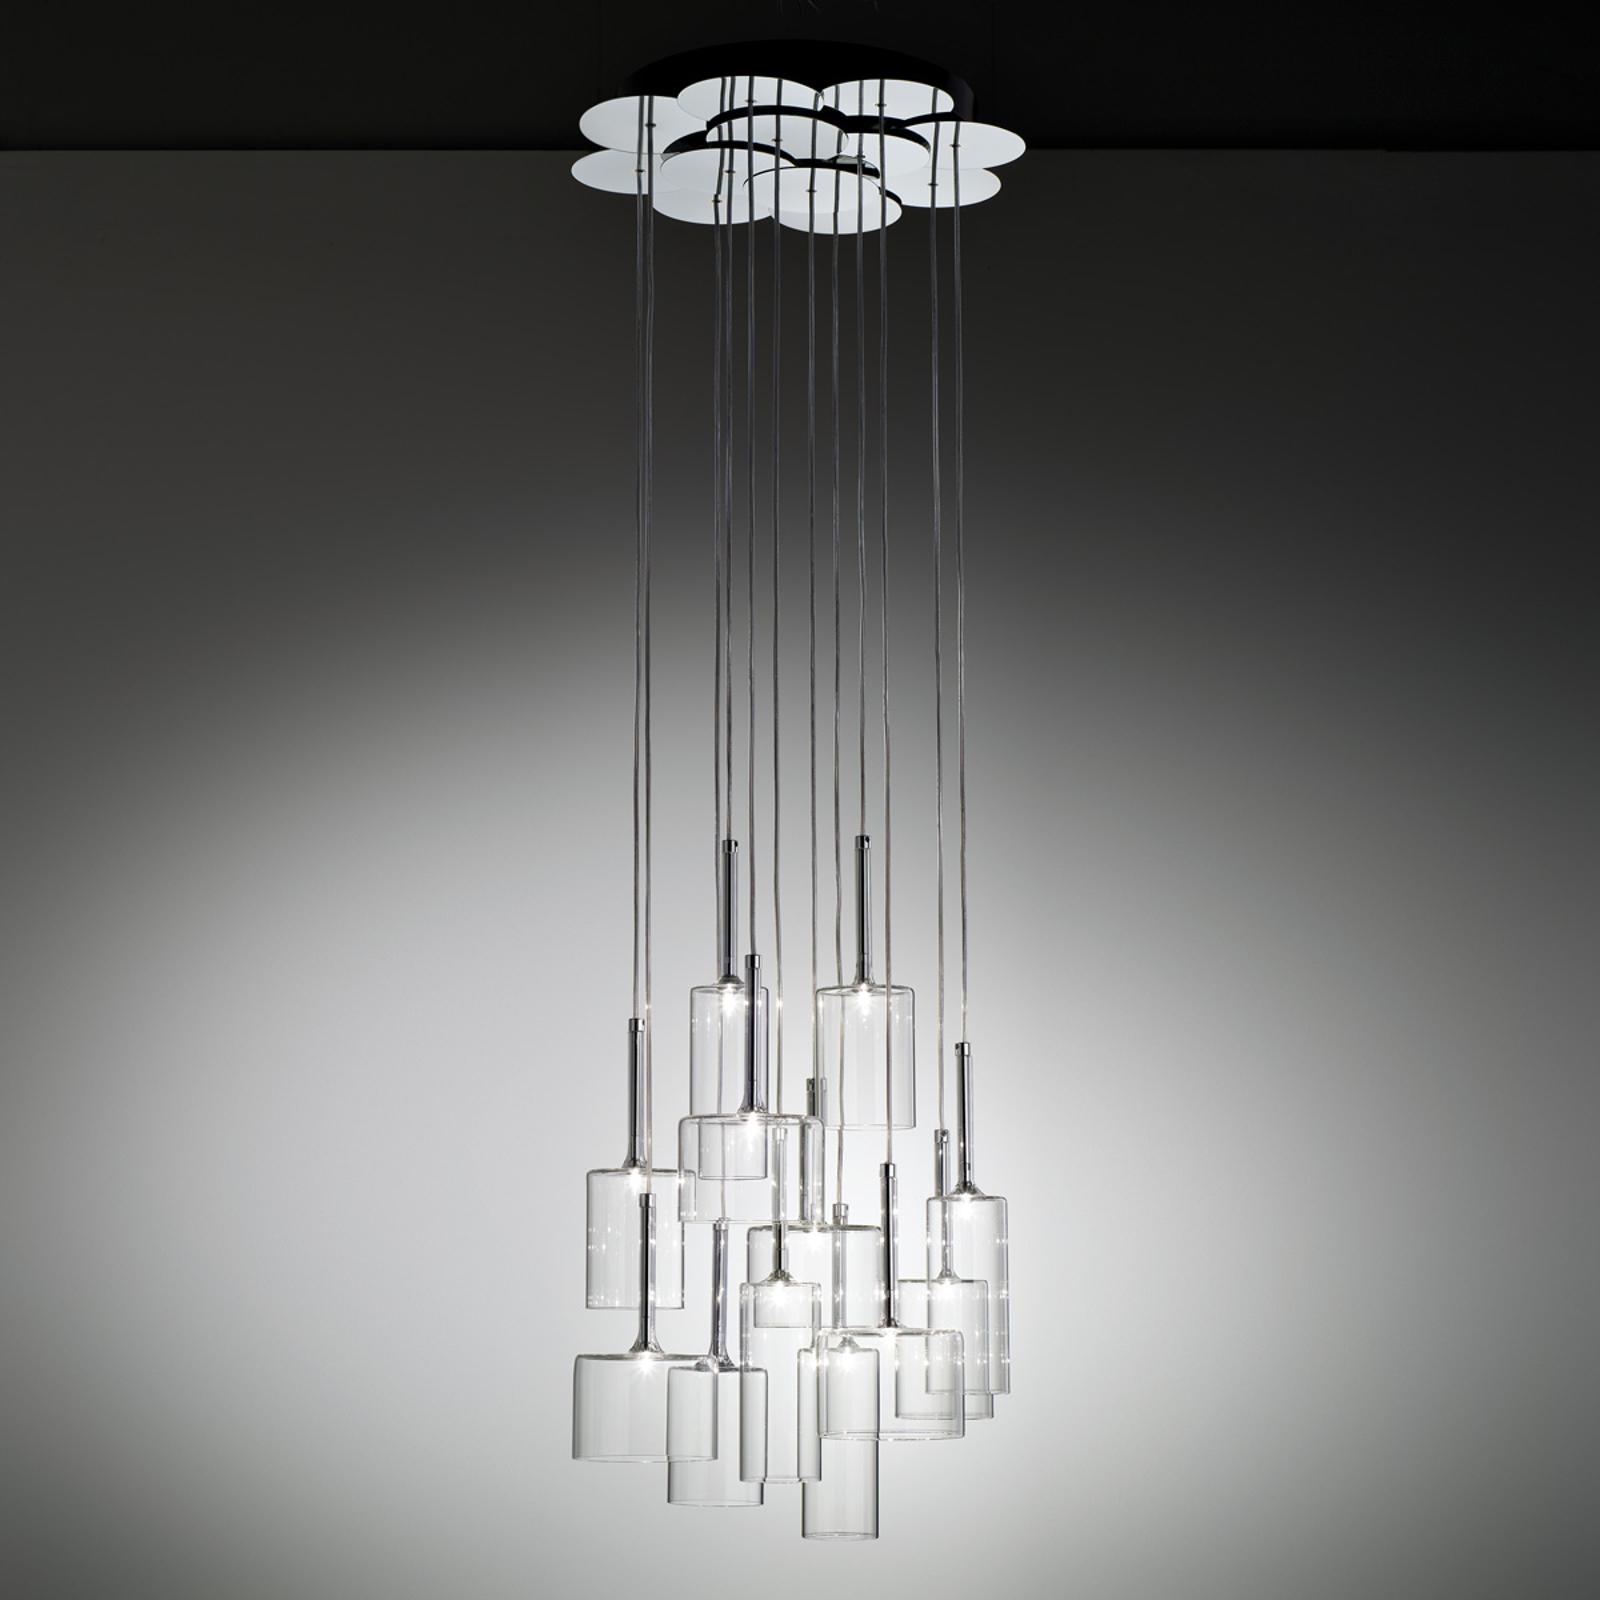 Szklana lampa wisząca Spillray 12-punktowa